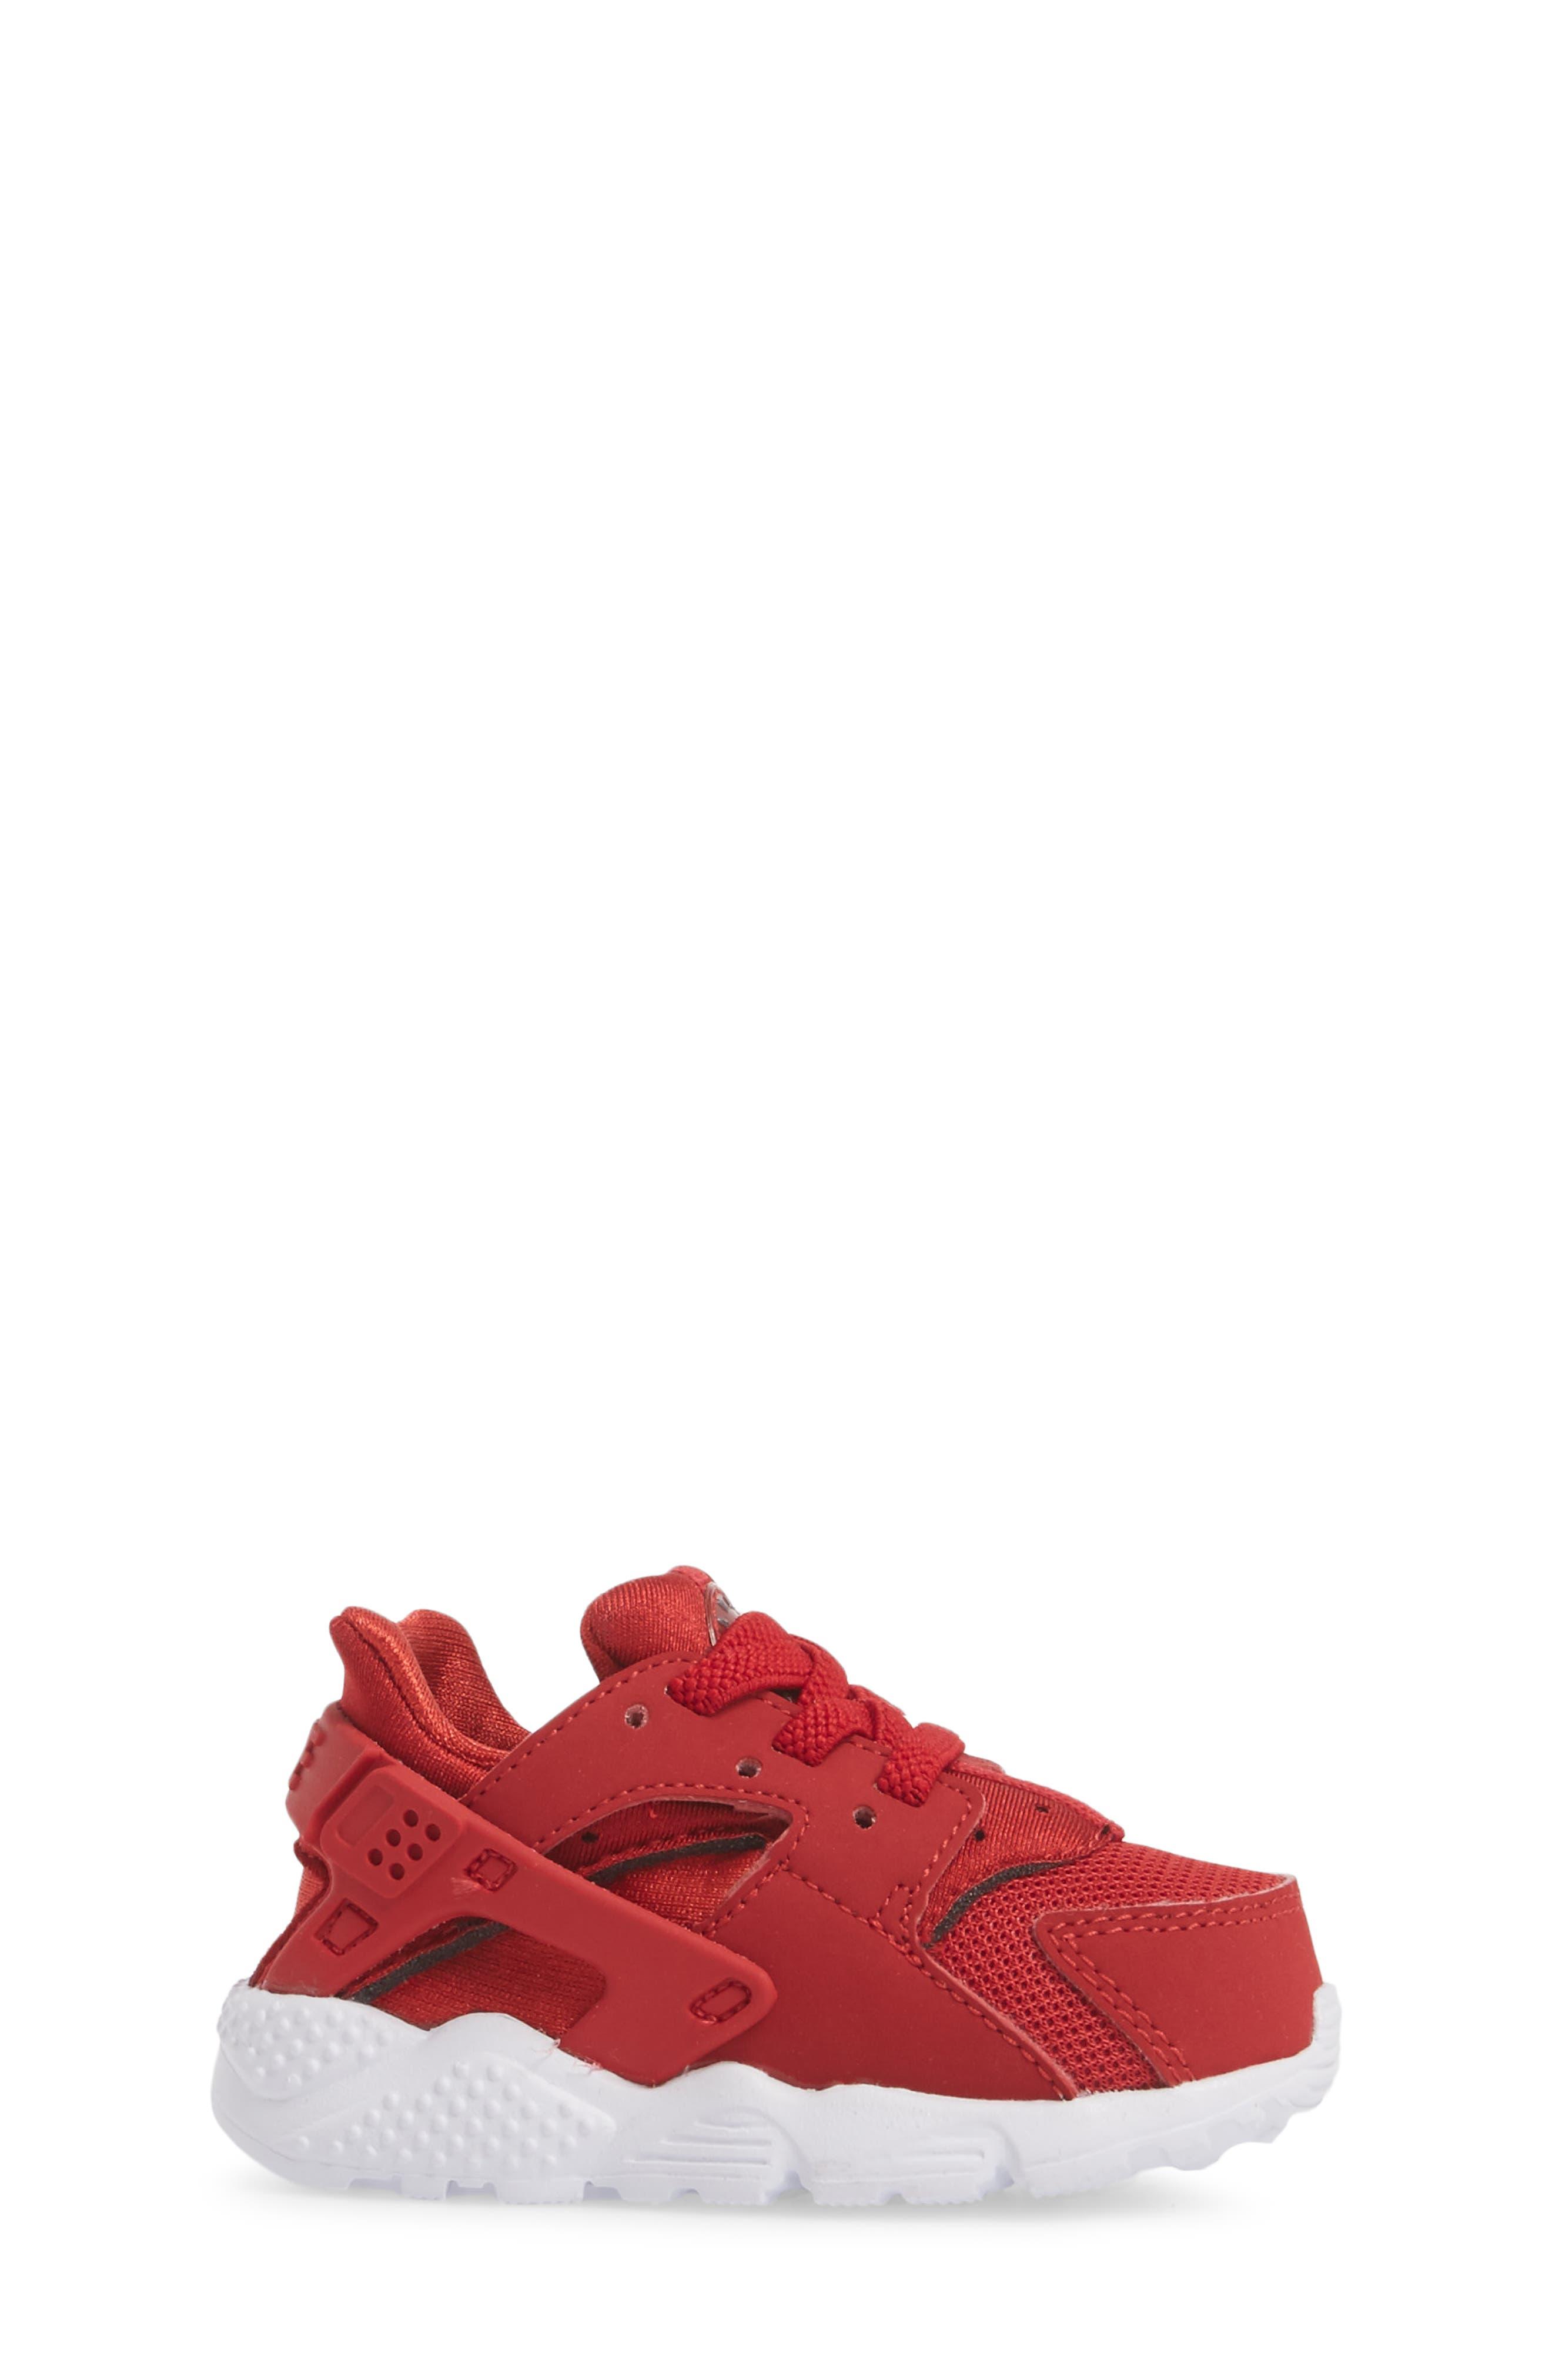 'Huarache Run' Sneaker,                             Alternate thumbnail 3, color,                             Gym Red/ Dark Grey/ White